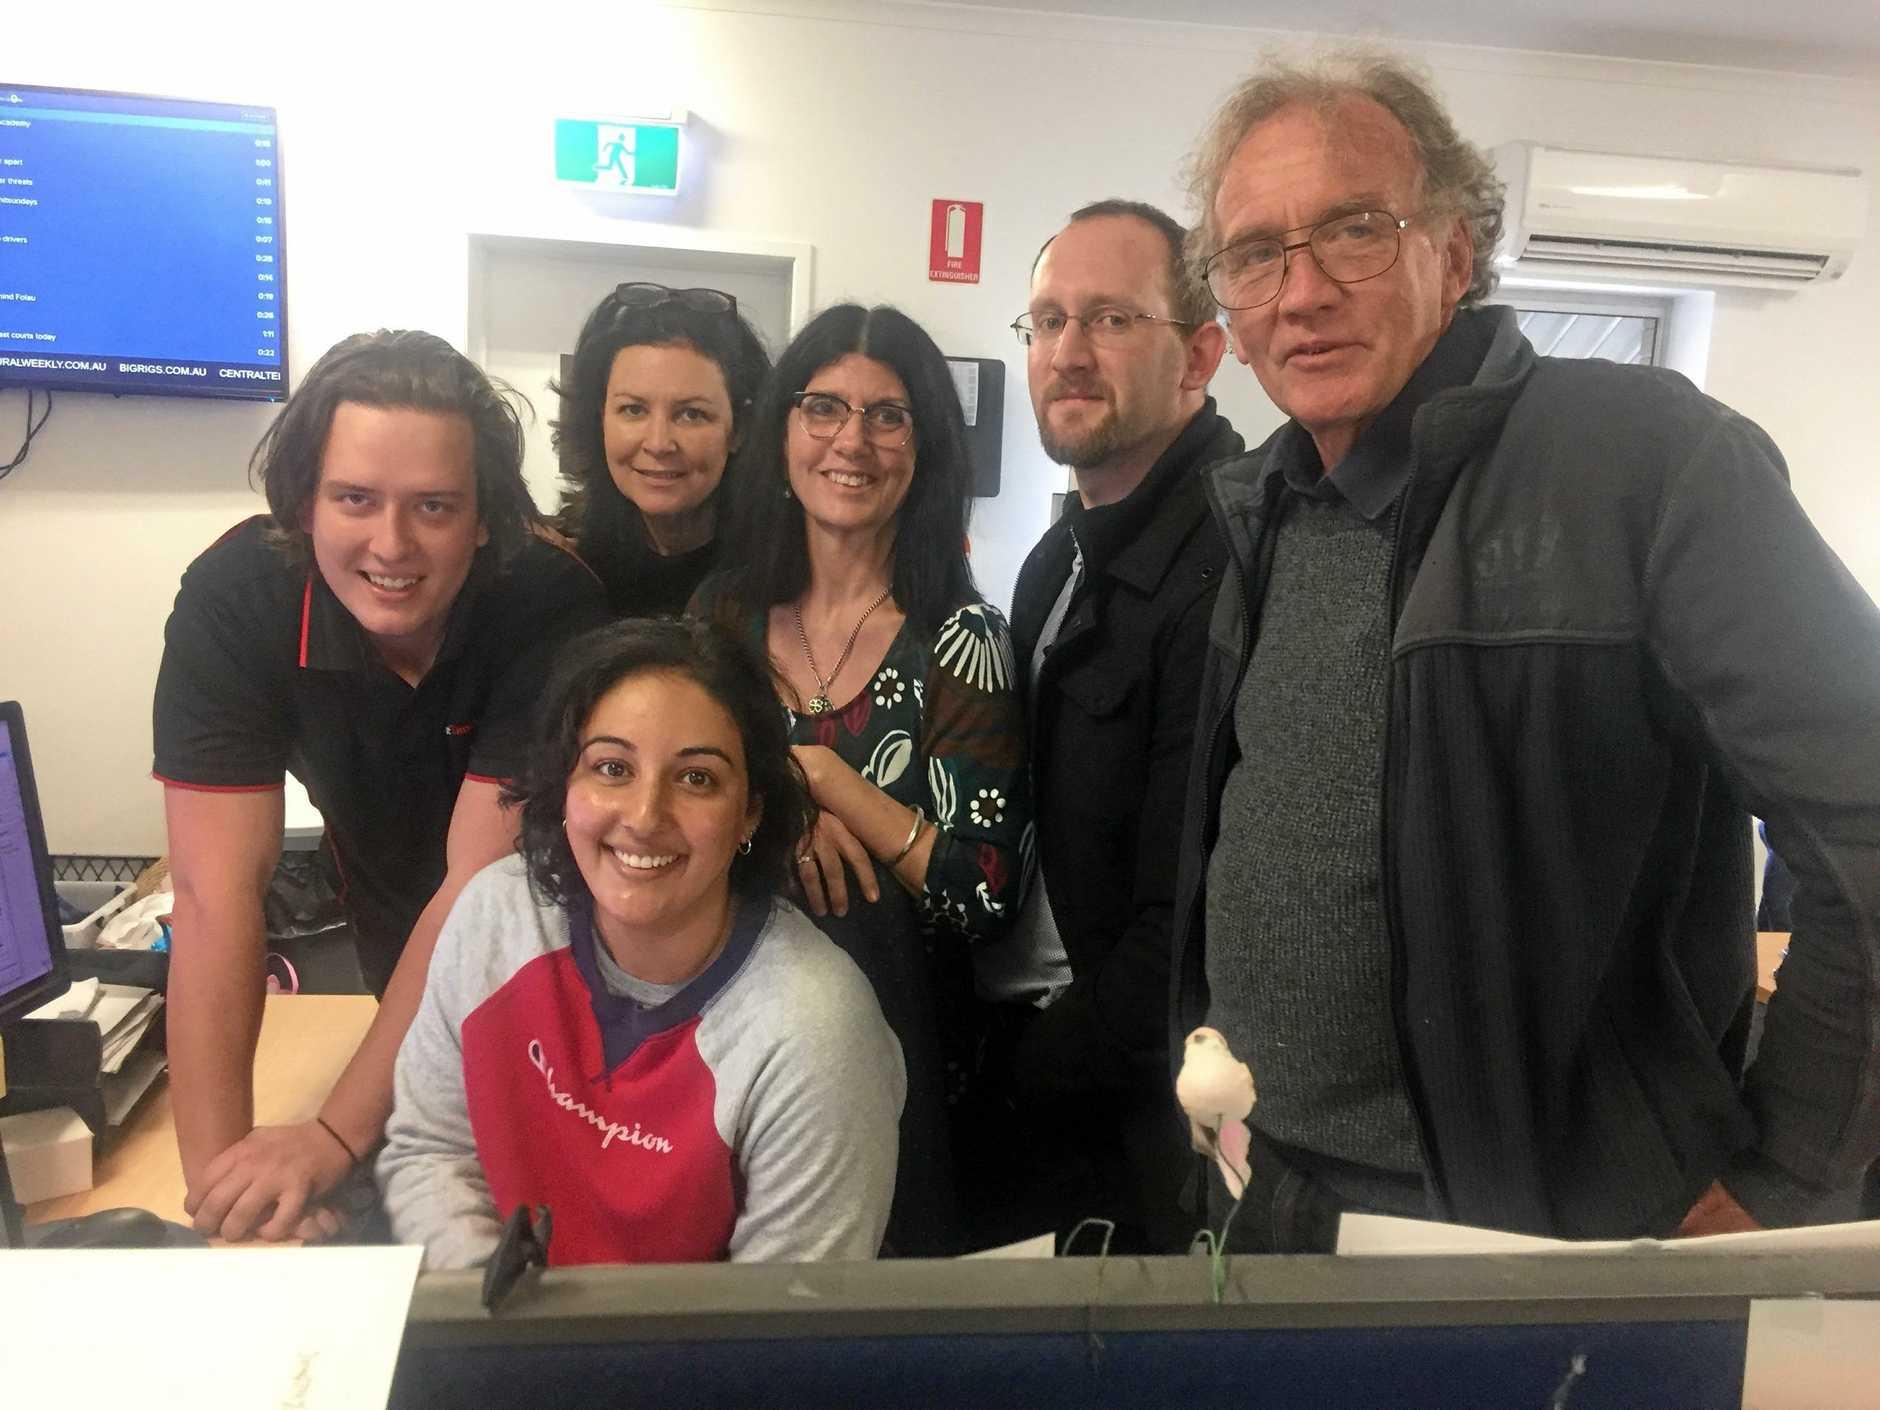 Some of The Gympie Times news crew - Josh Preston, Bec Singh, Shelley Strachan, Rowena Robertson, Scott Kovacevic and Arthur Gorrie.